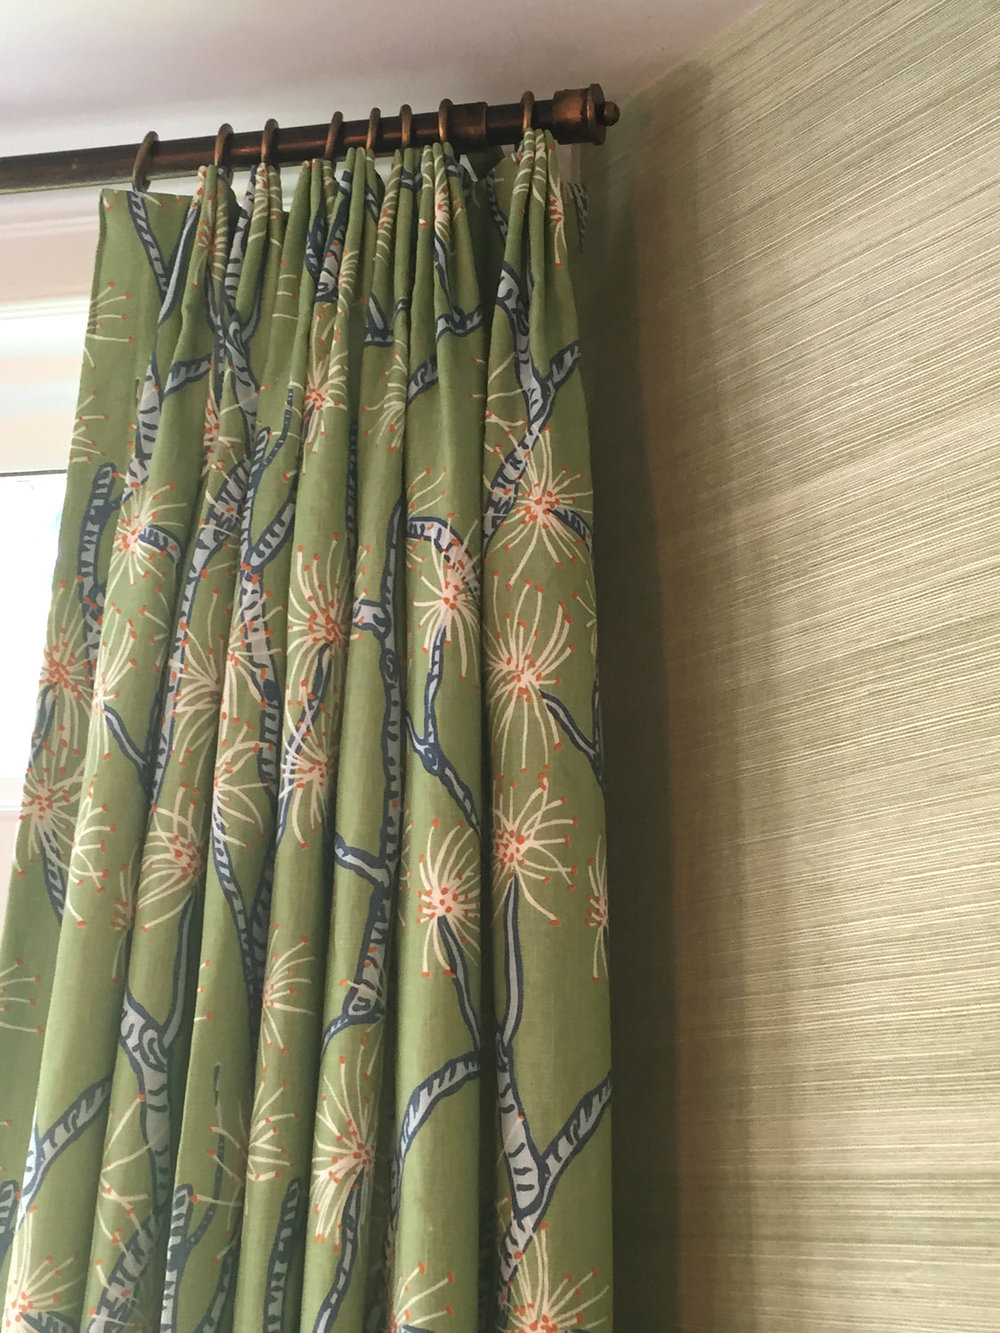 green-drapes.jpg